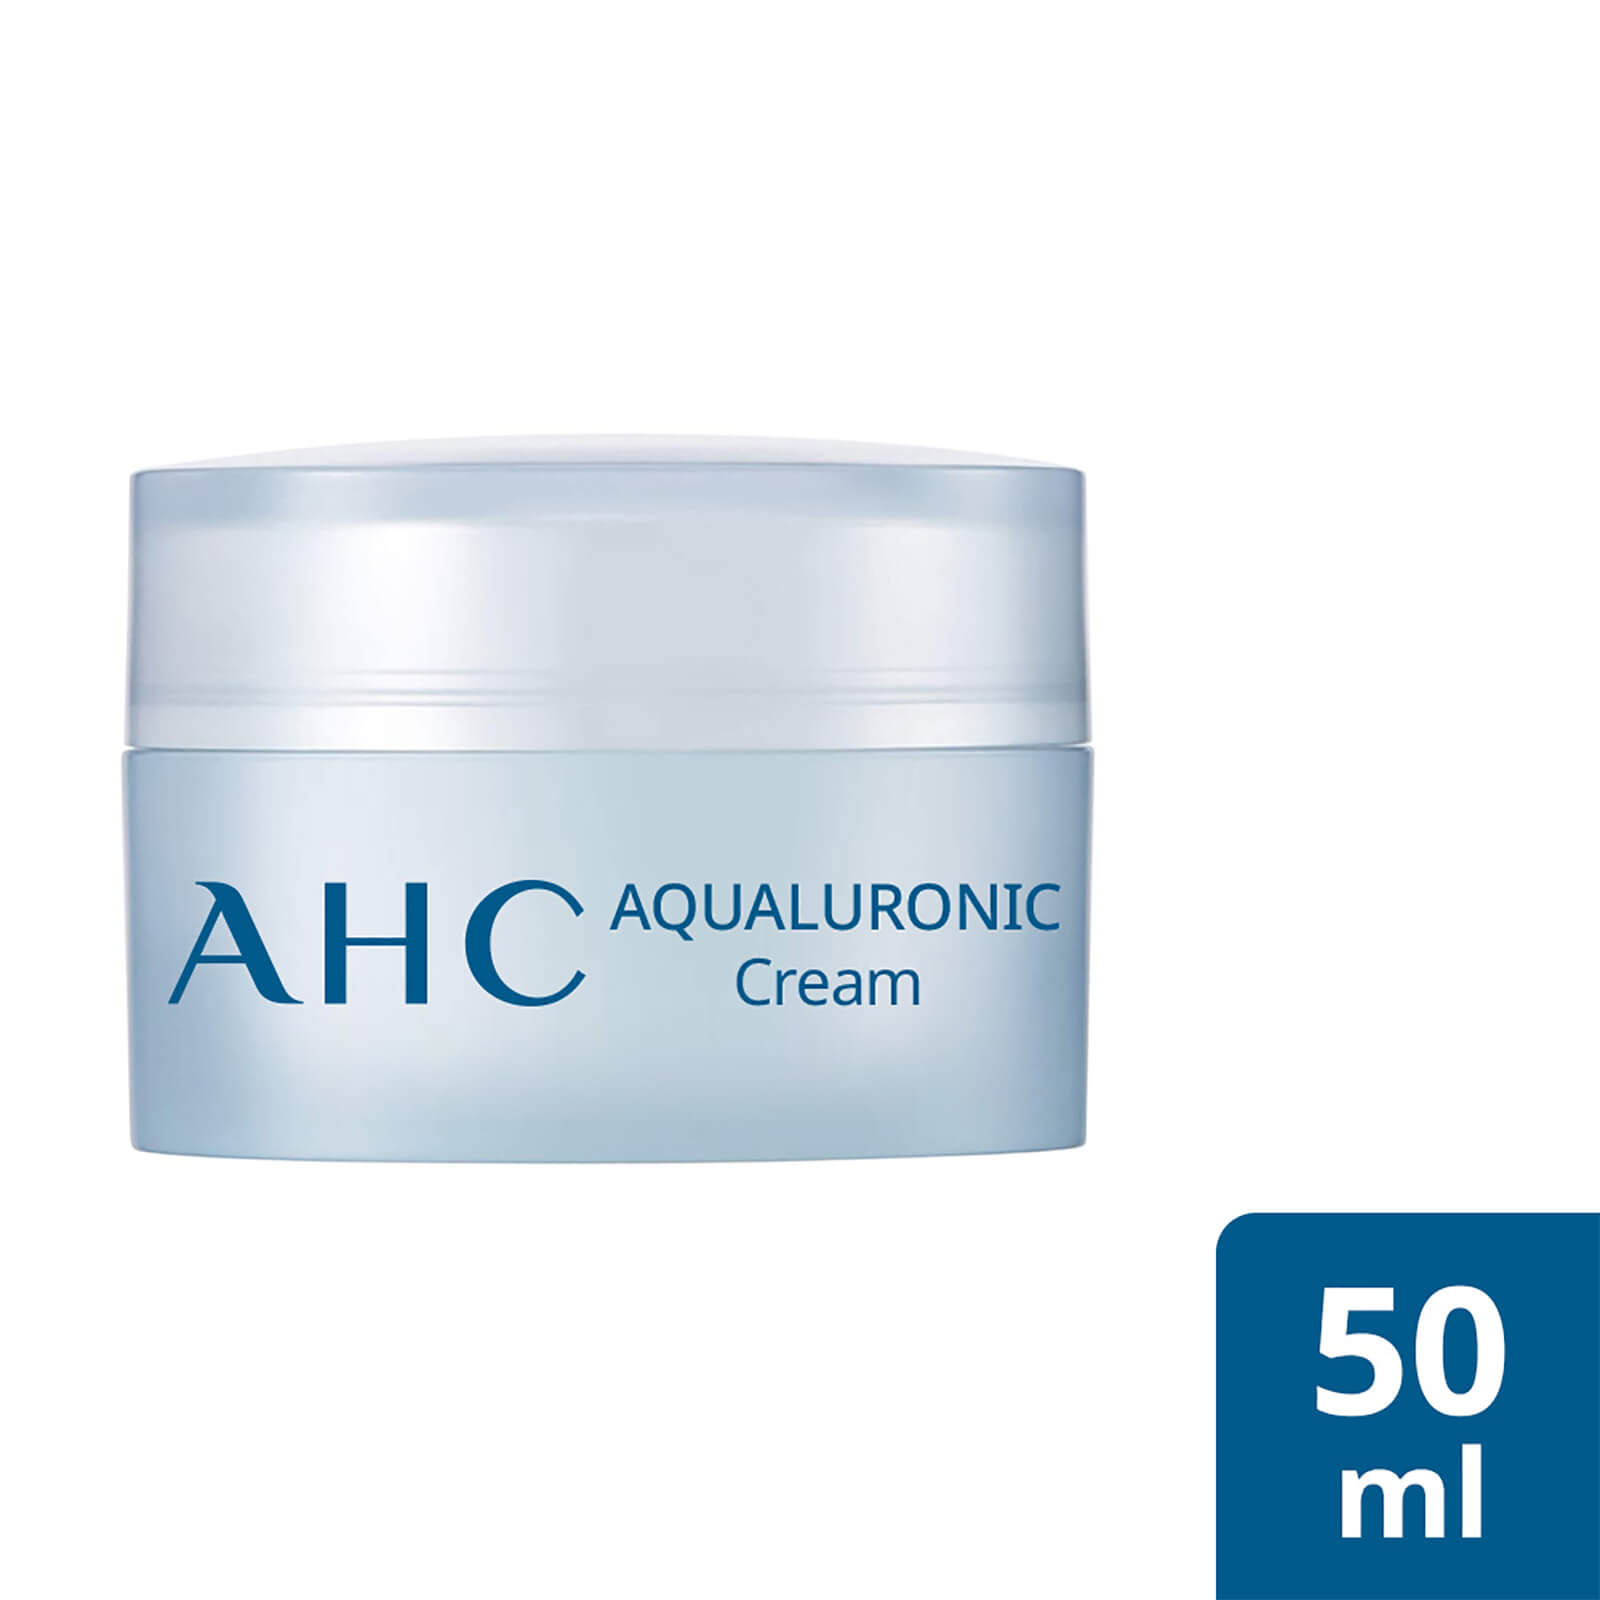 Купить AHC Face Cream Aqualuronic Hydrating Triple Hyaluronic Acid 50ml